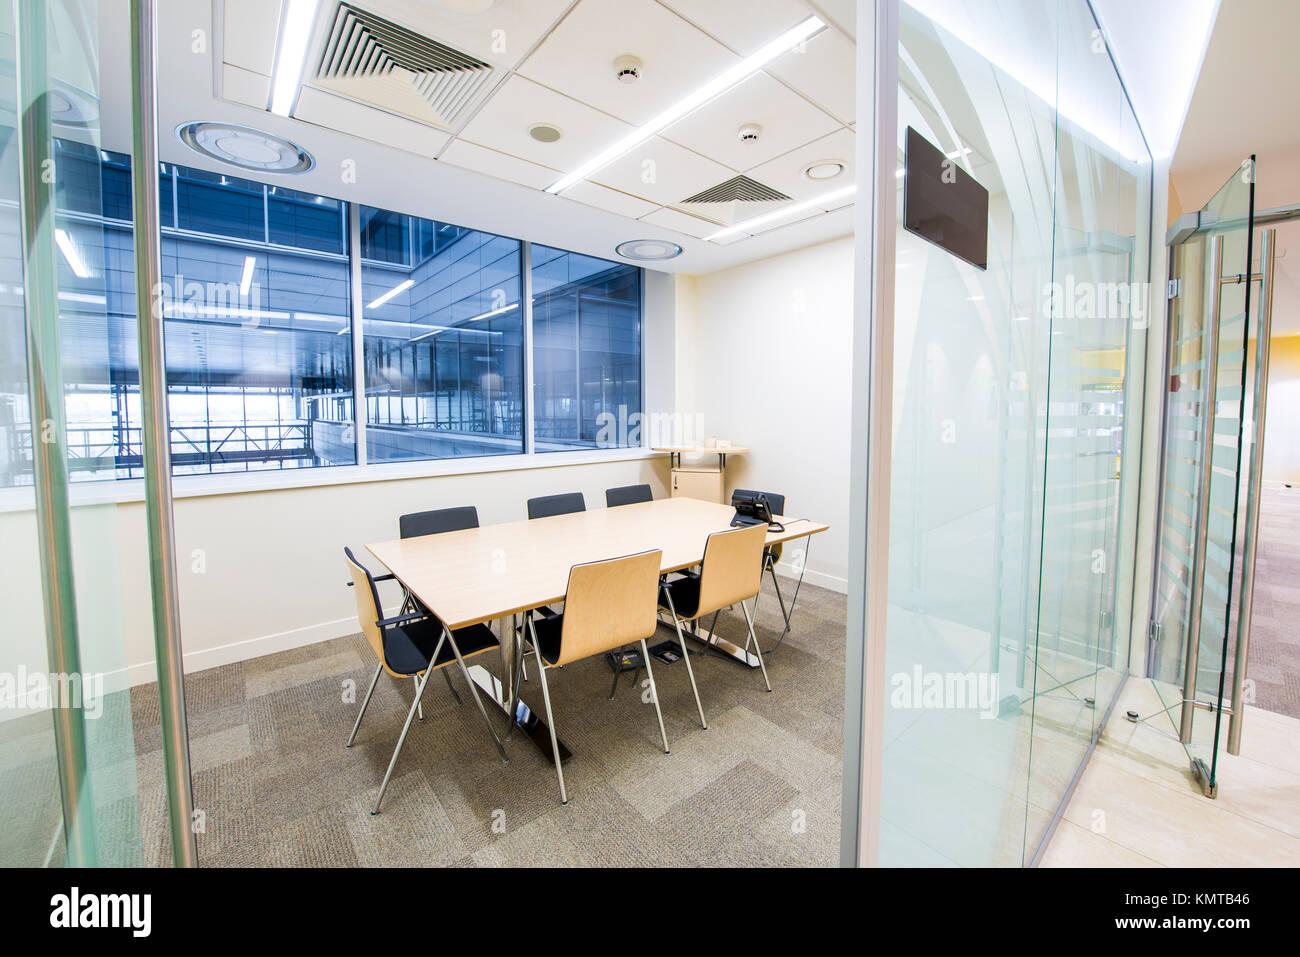 Empty small meeting room. Bright modern interior. Glass walls Stock Photo